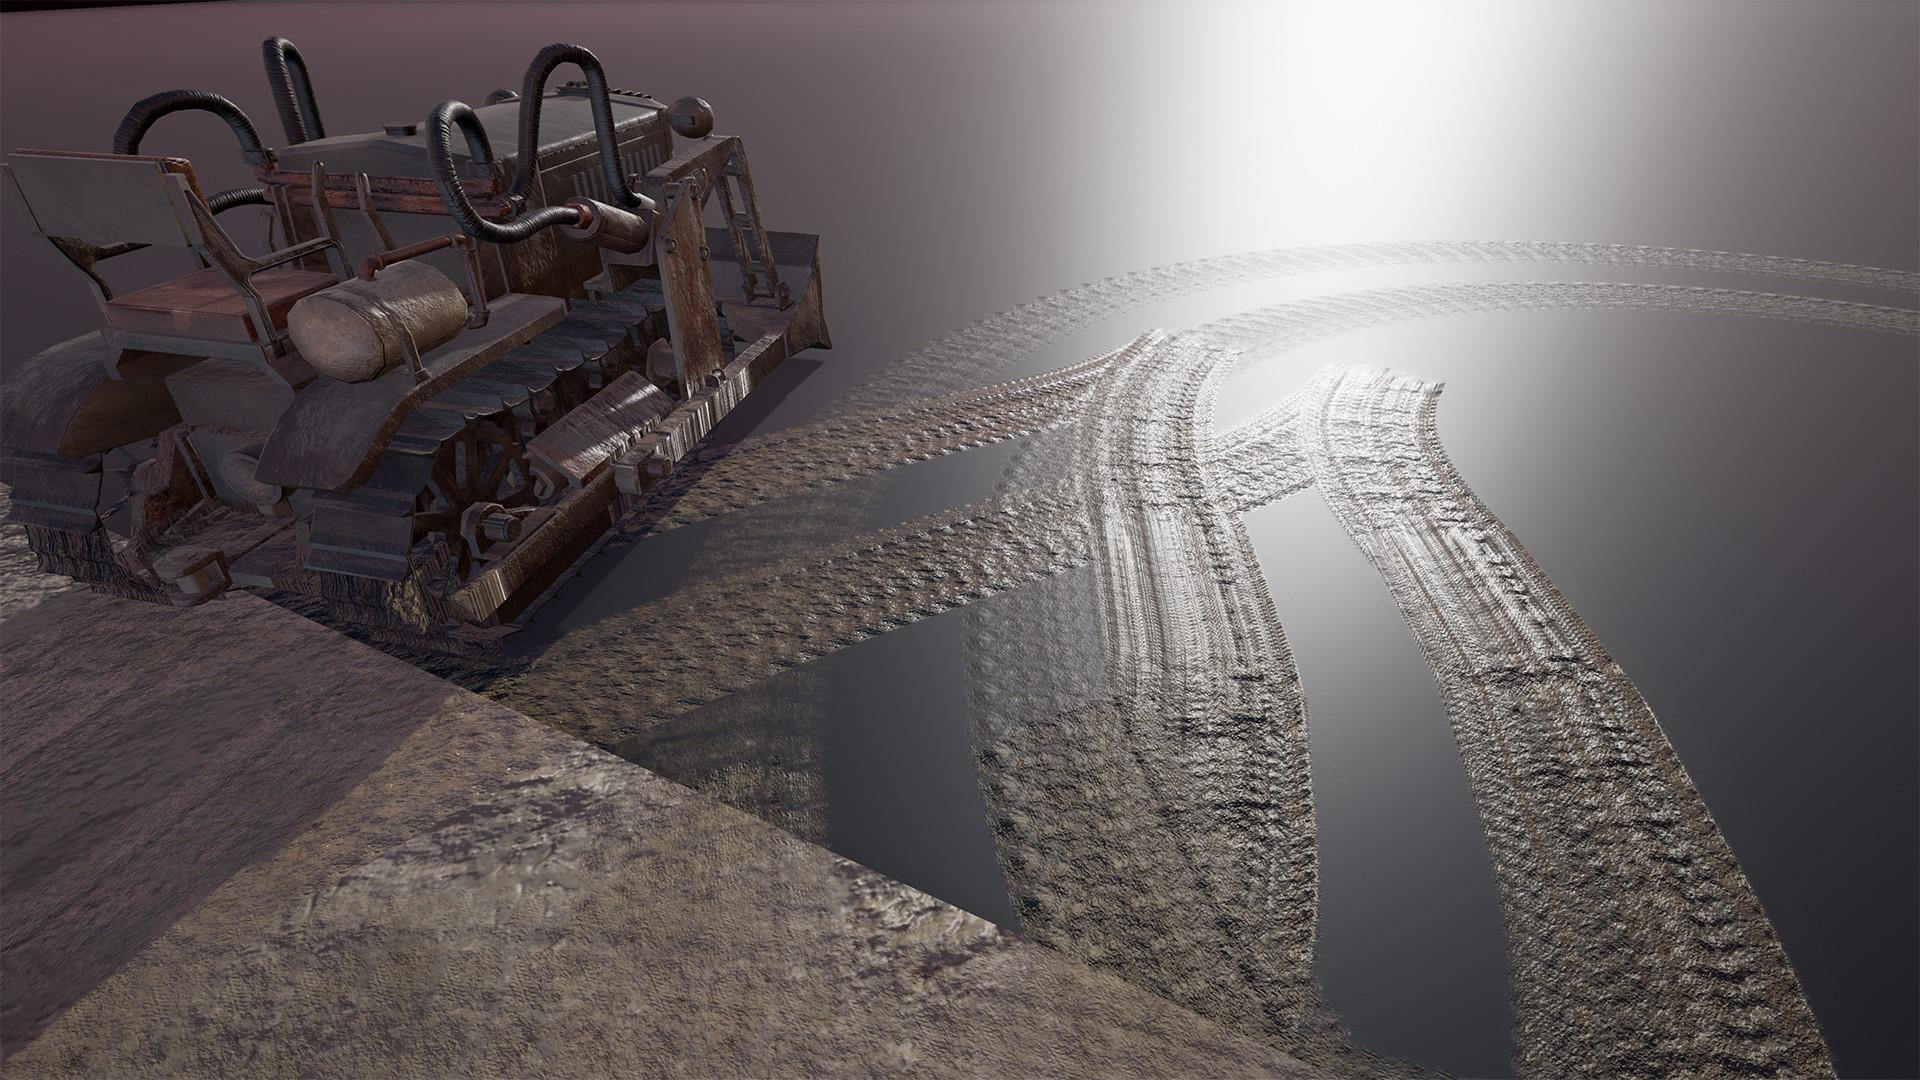 ArtStation - Vehicle tracks system for unreal engine, Thijs